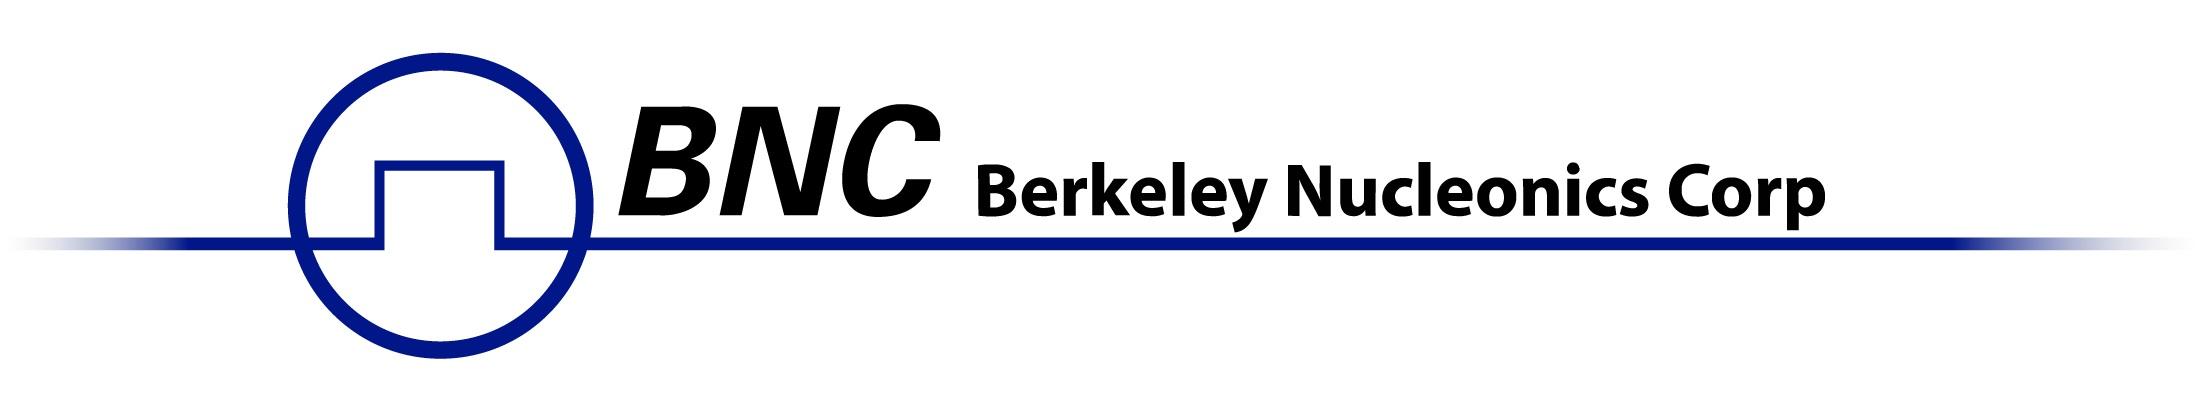 Berkeley Nucleonics Corporation (BNC)